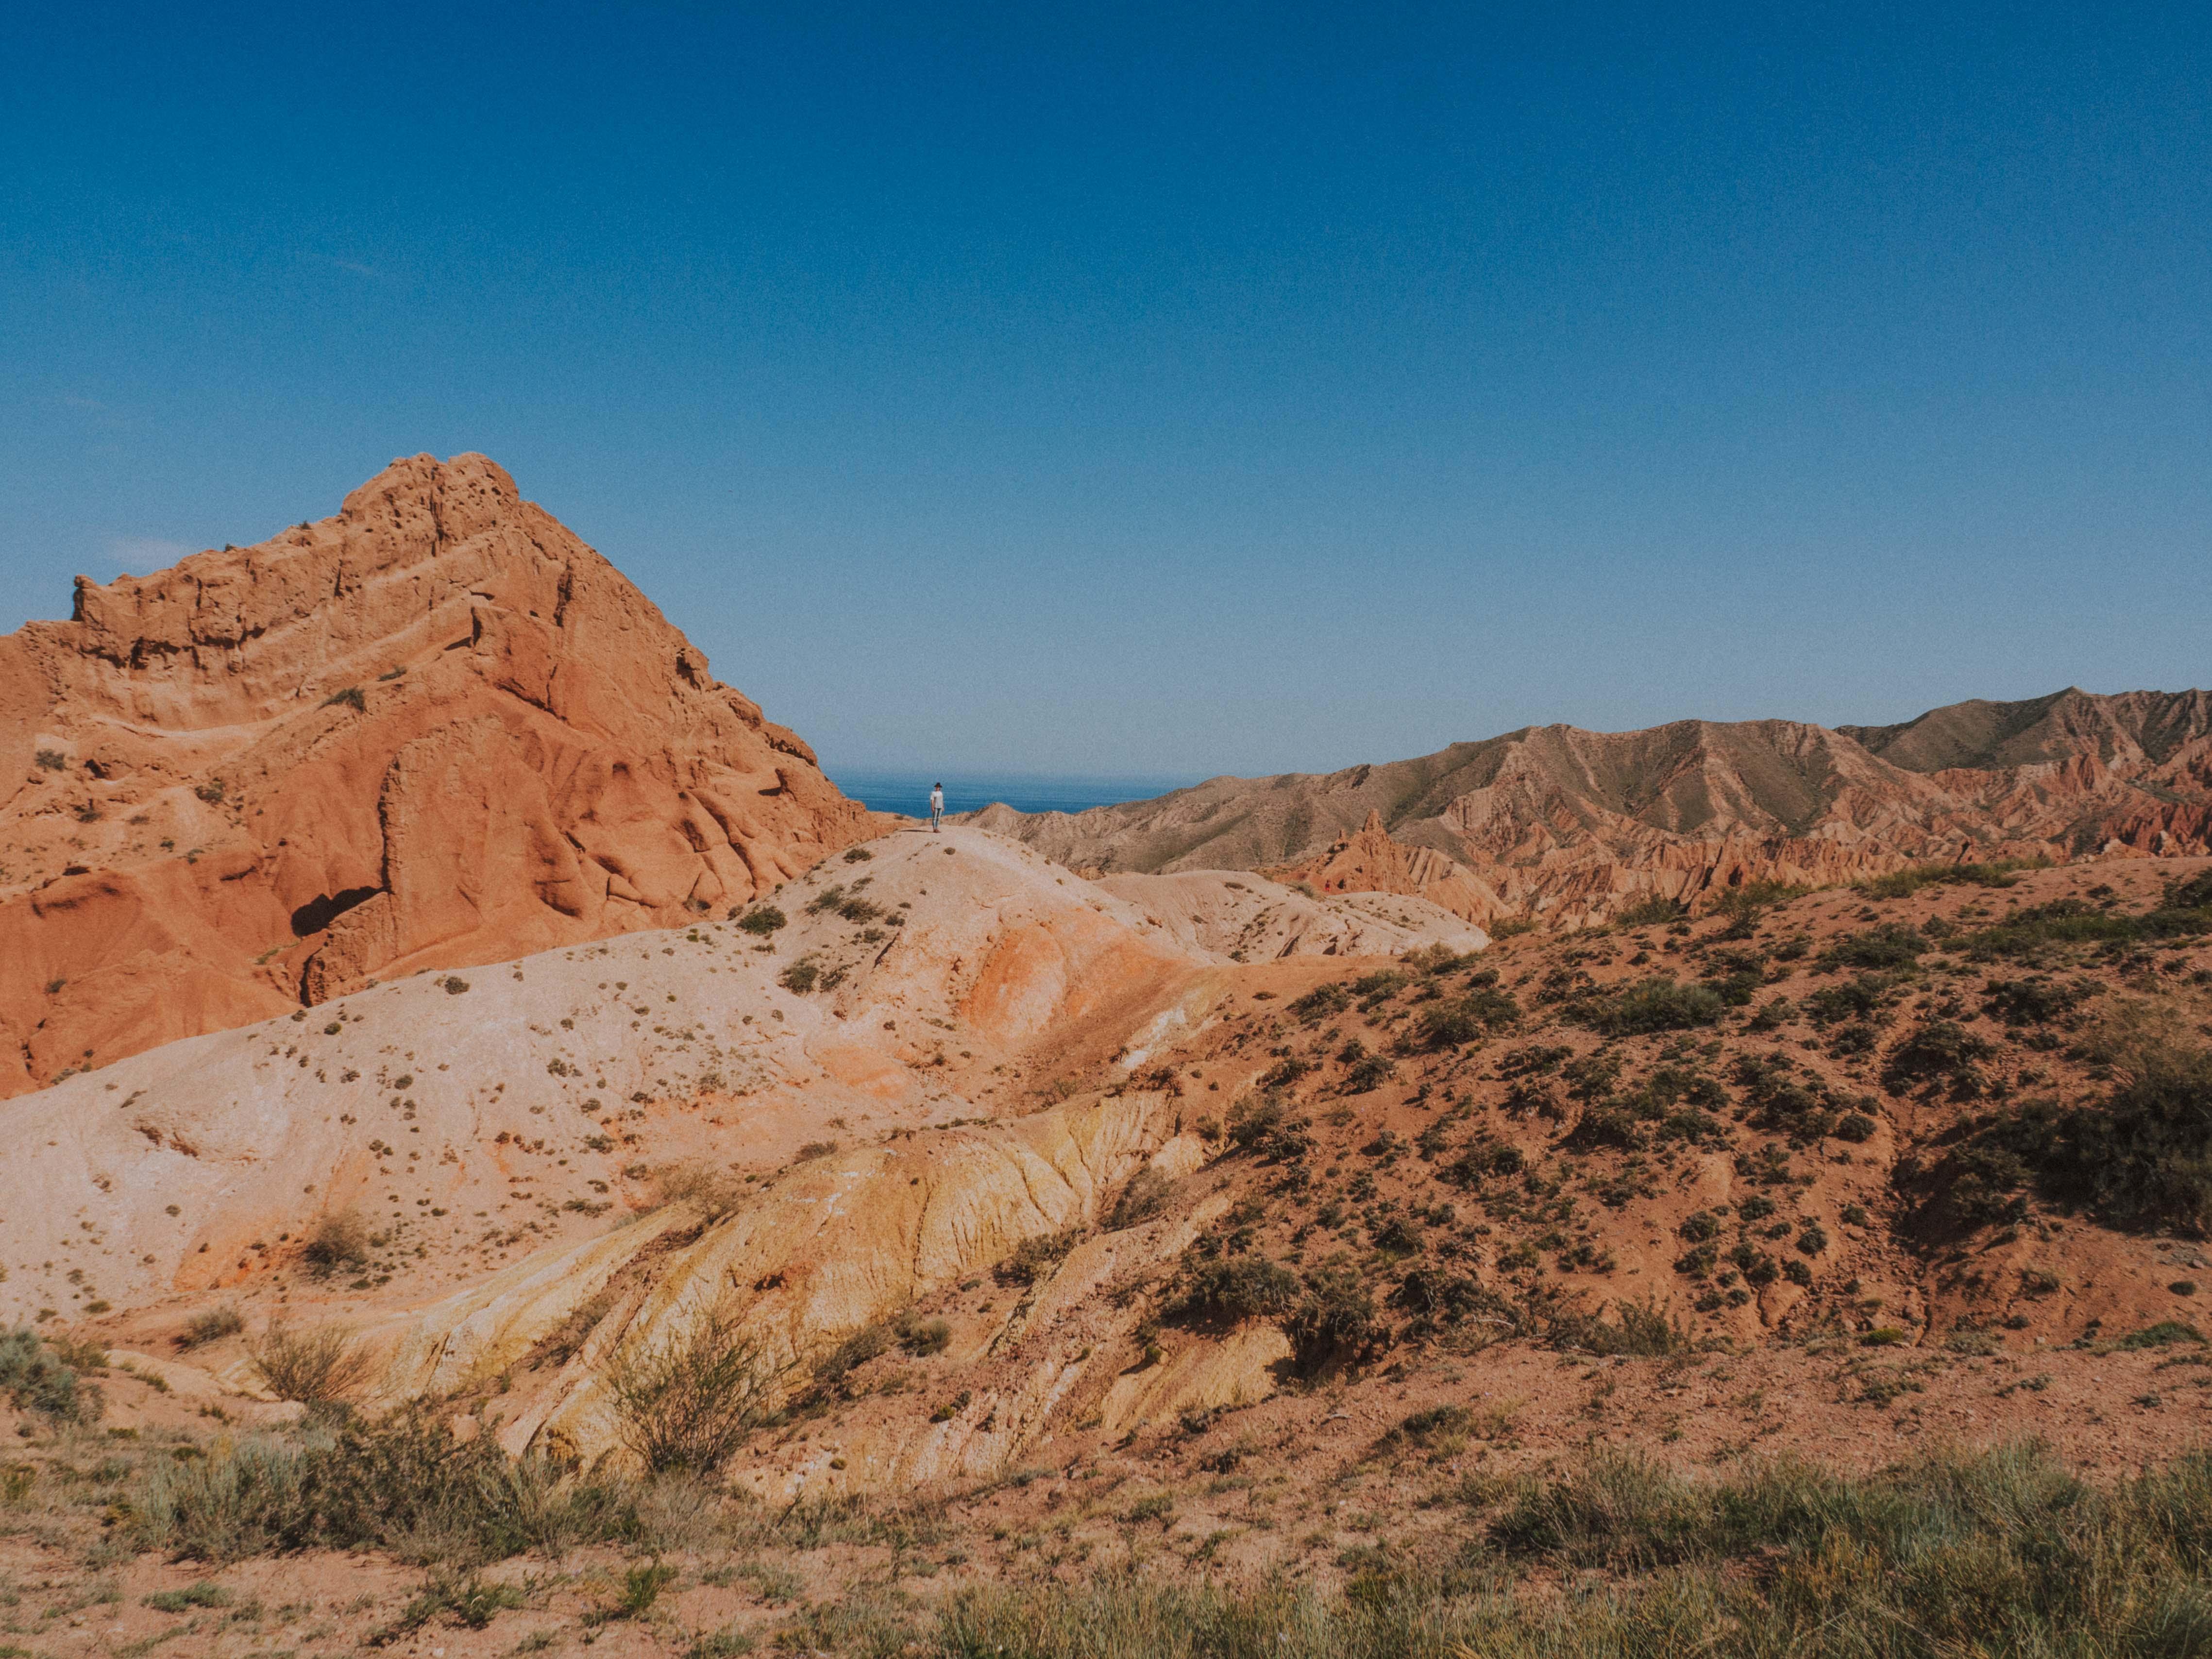 Image for blog article: Skazka Canyon